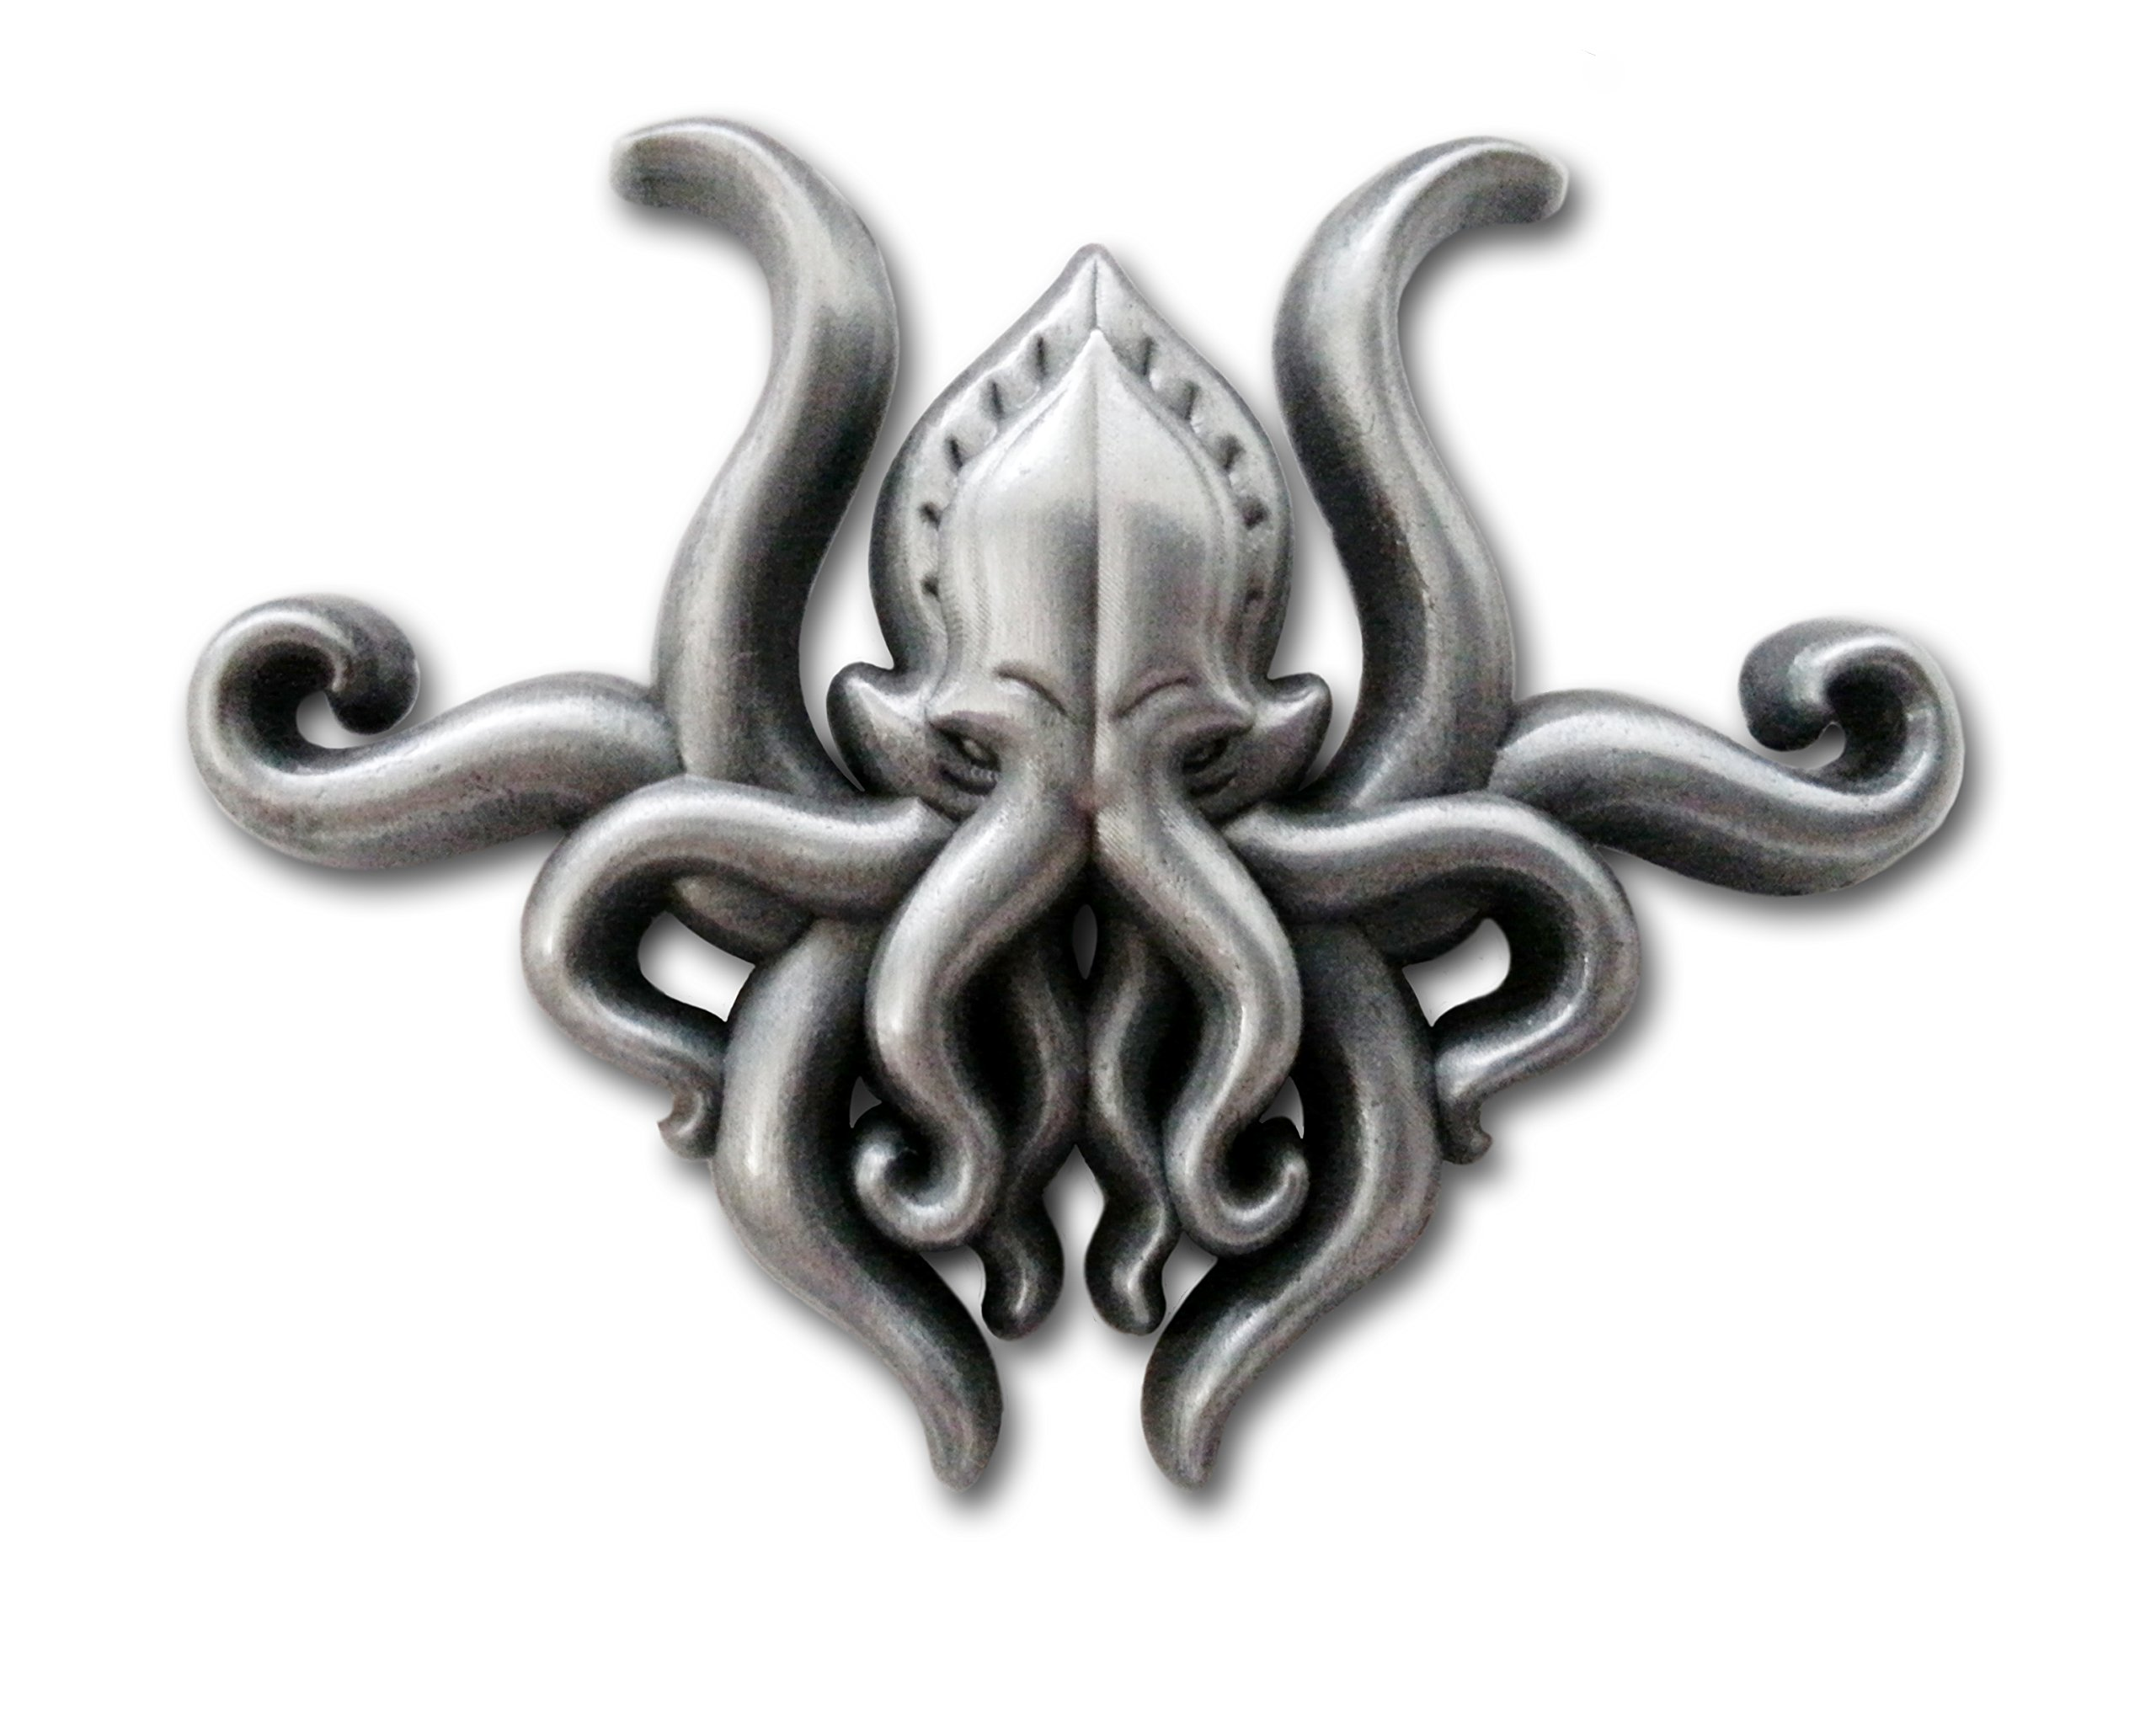 Pinsanity H.P. Lovecraft Cthulhu Lapel Pin